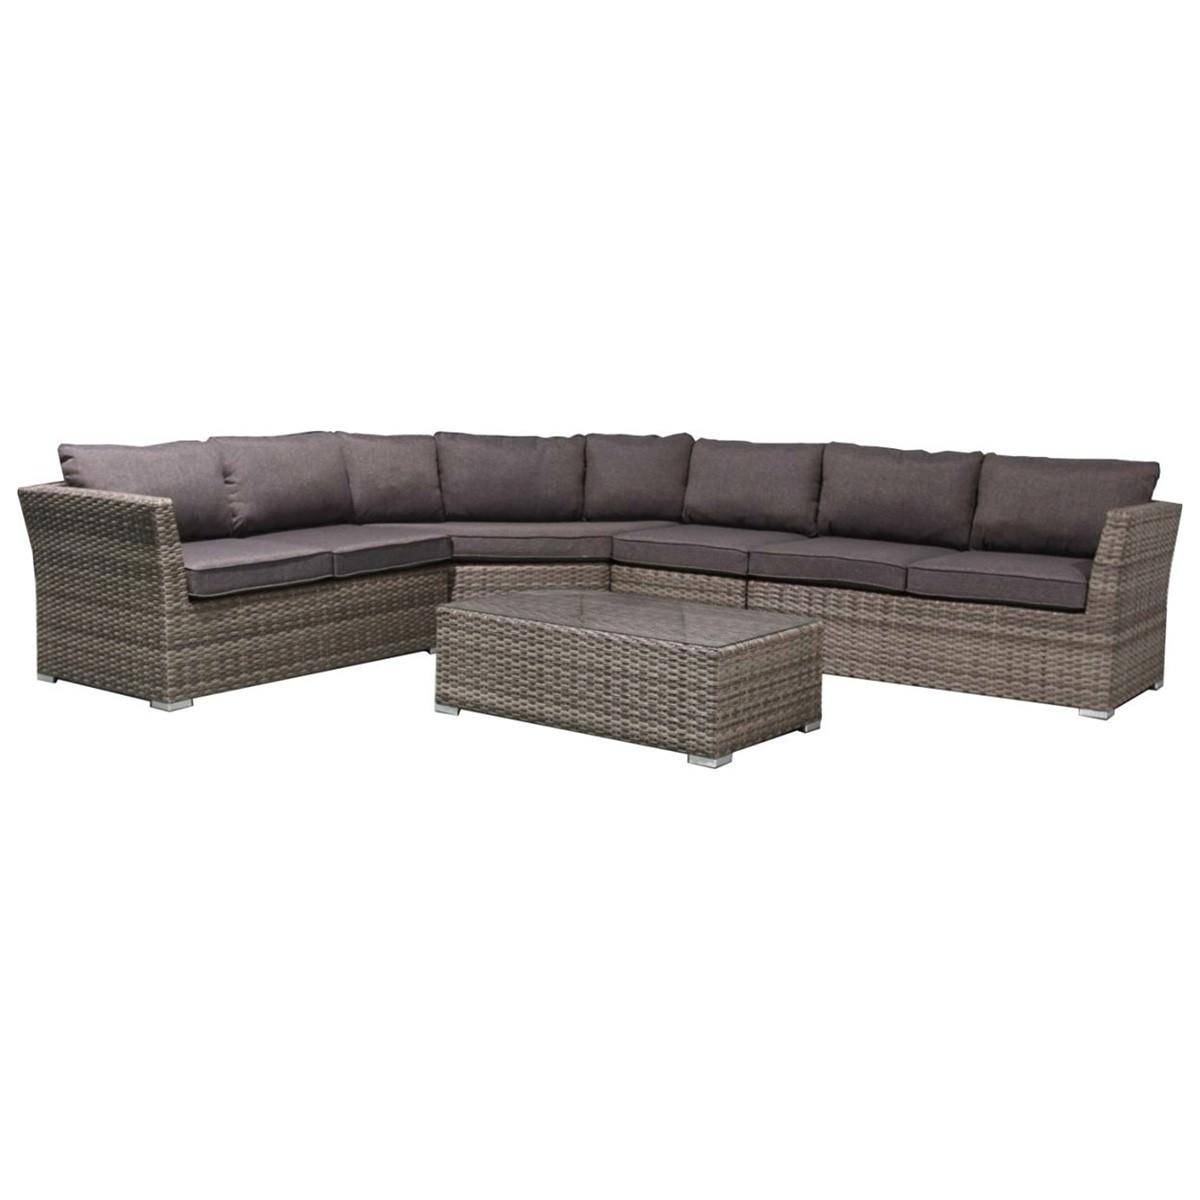 Reston 5 Piece Wicker Outdoor Modular Corner Lounge Set, 6 Seater